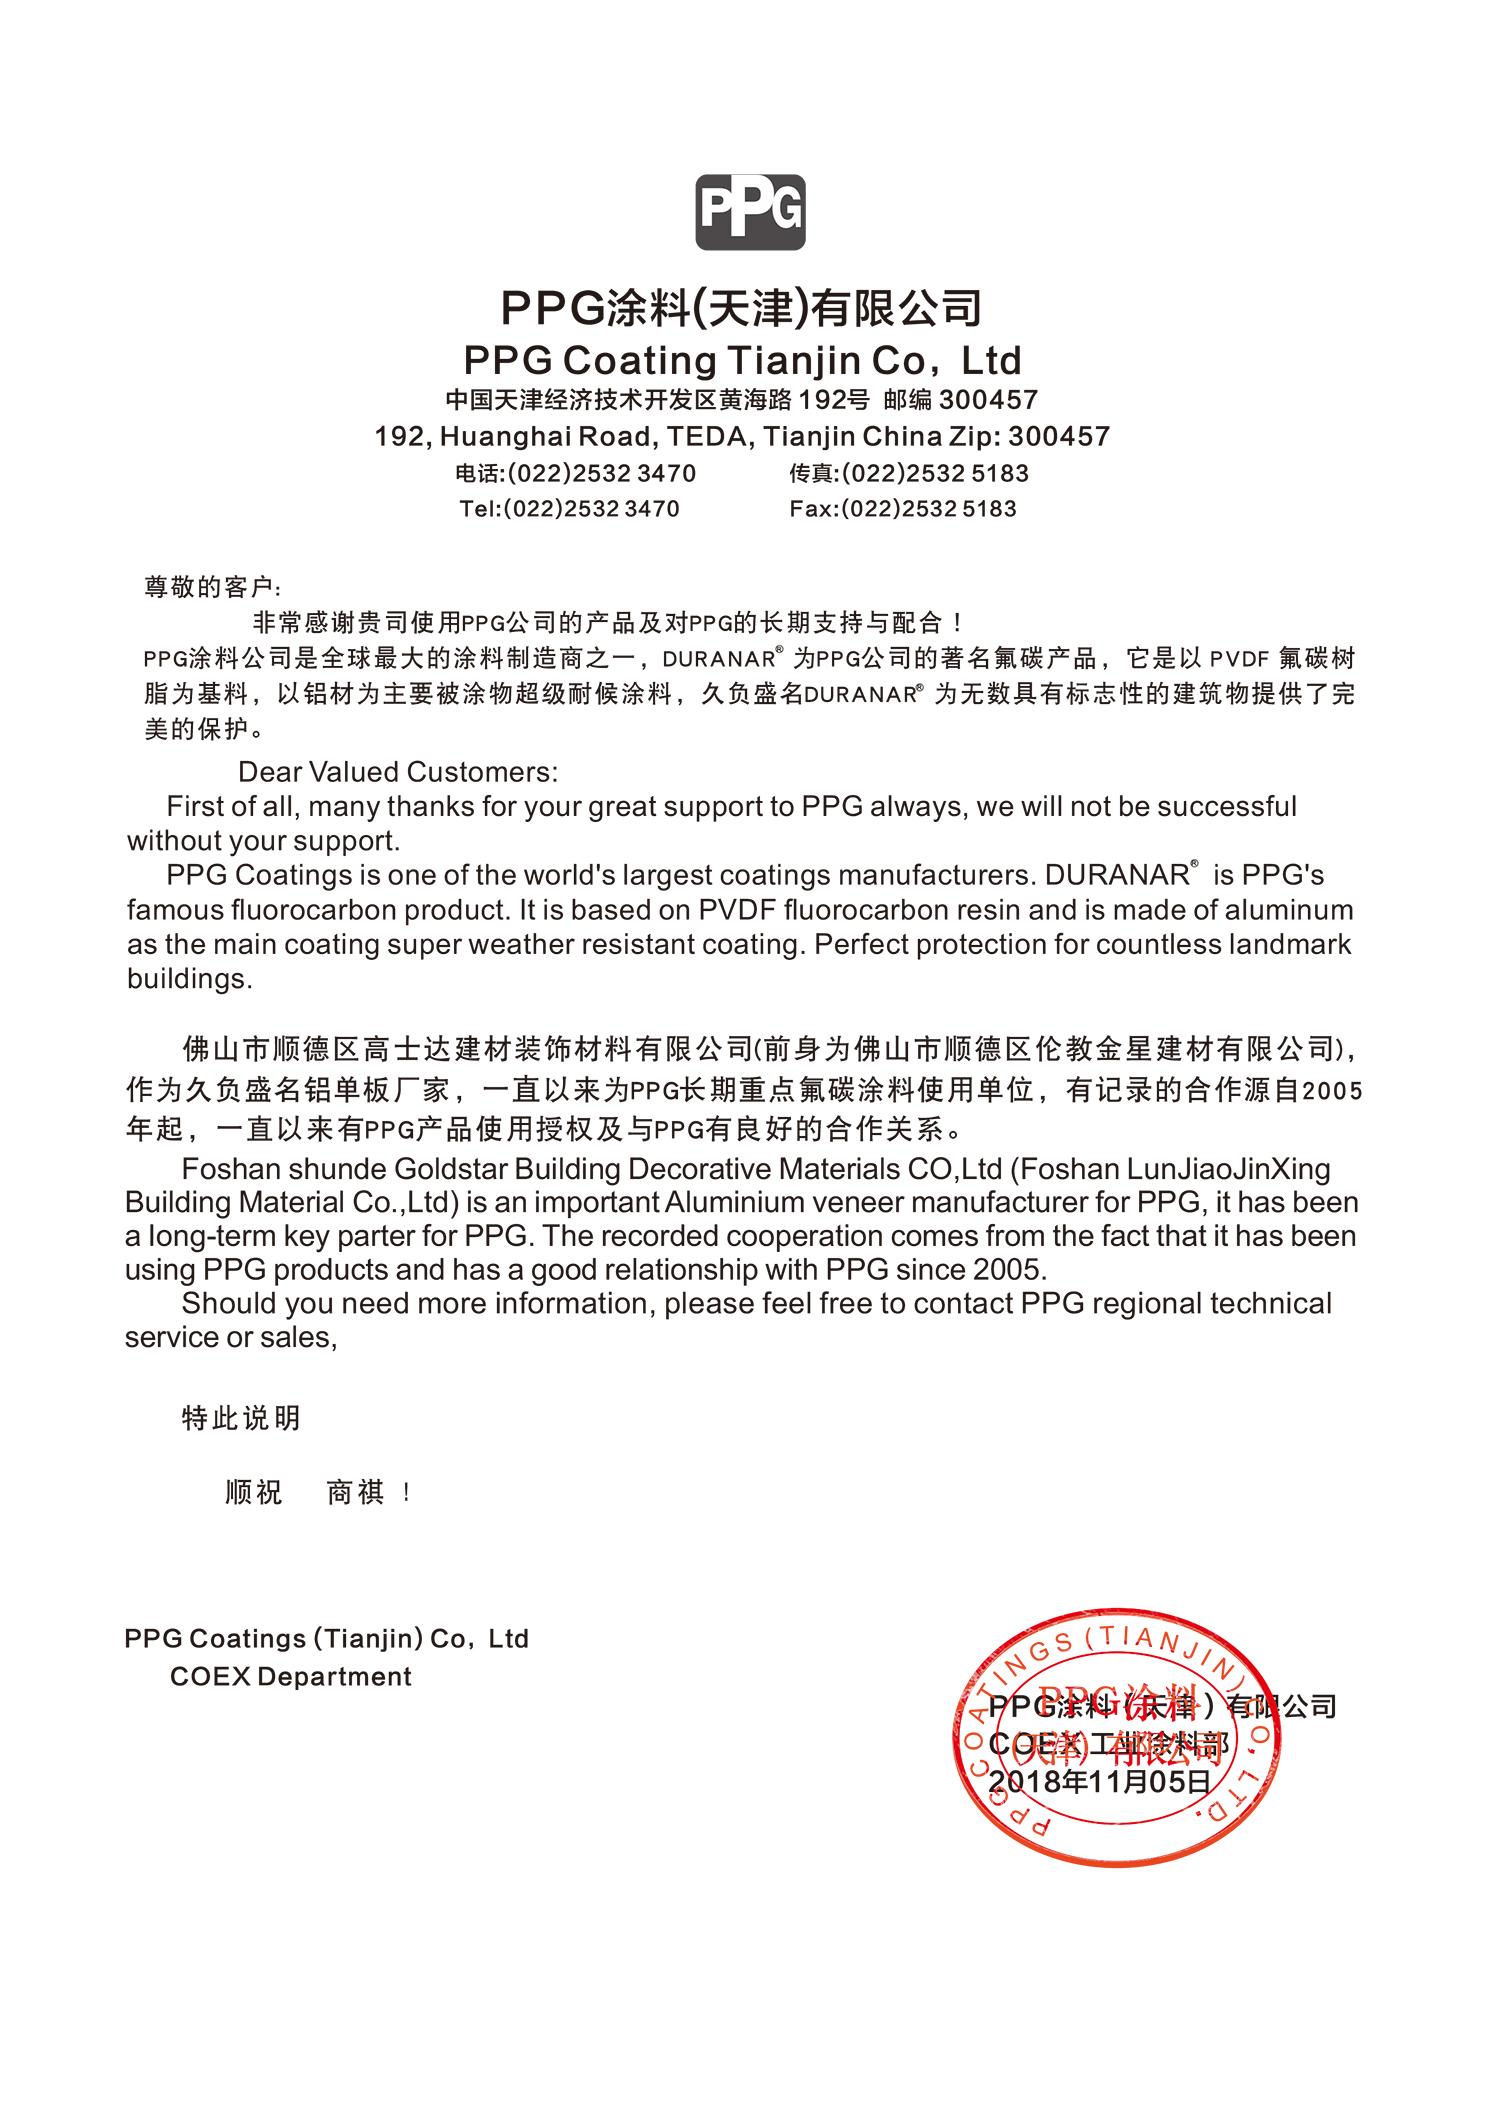 PPG涂料与亚搏官方app下载合作说明2019